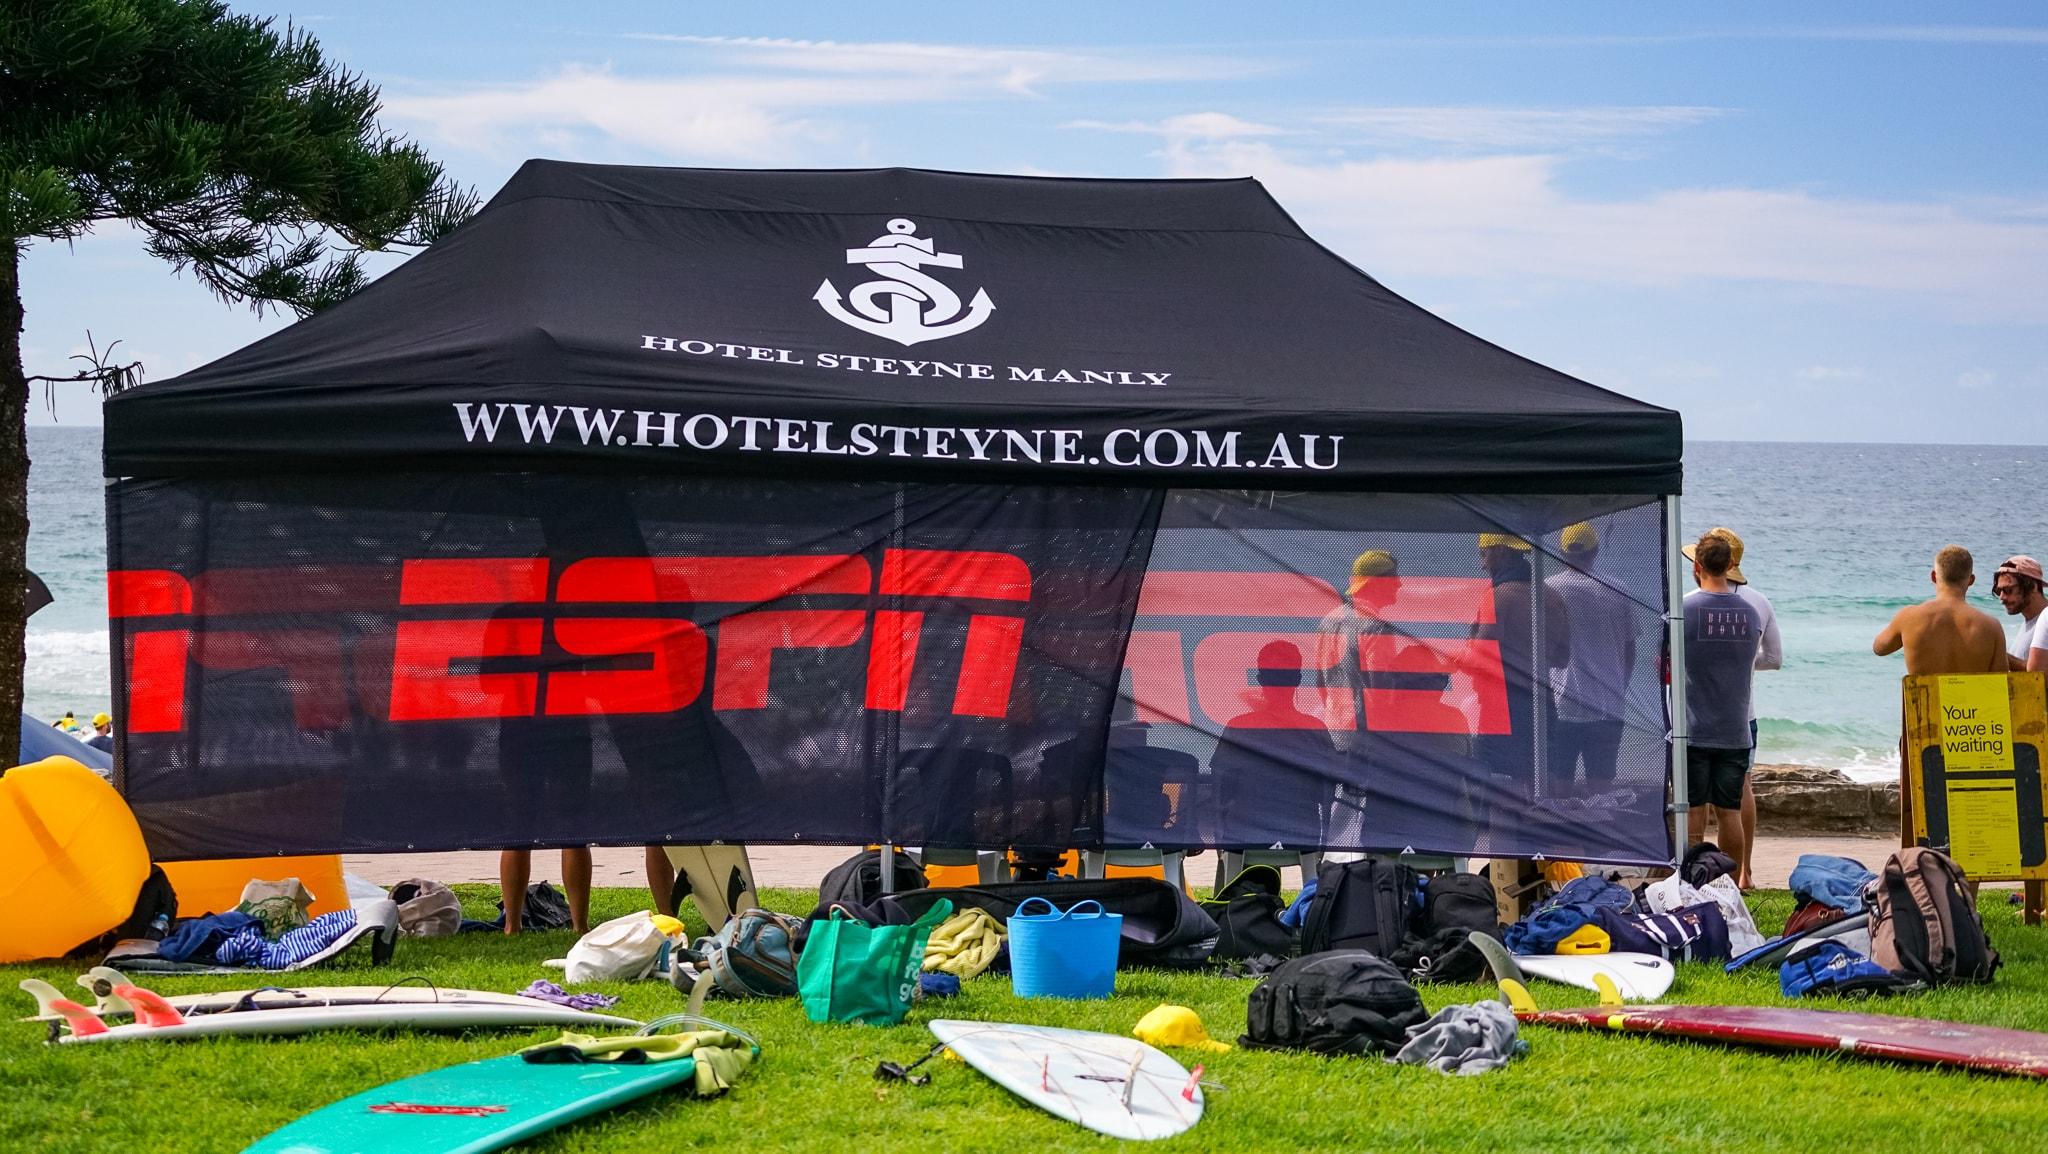 The Big Kahuna surf charity event with UnLtd